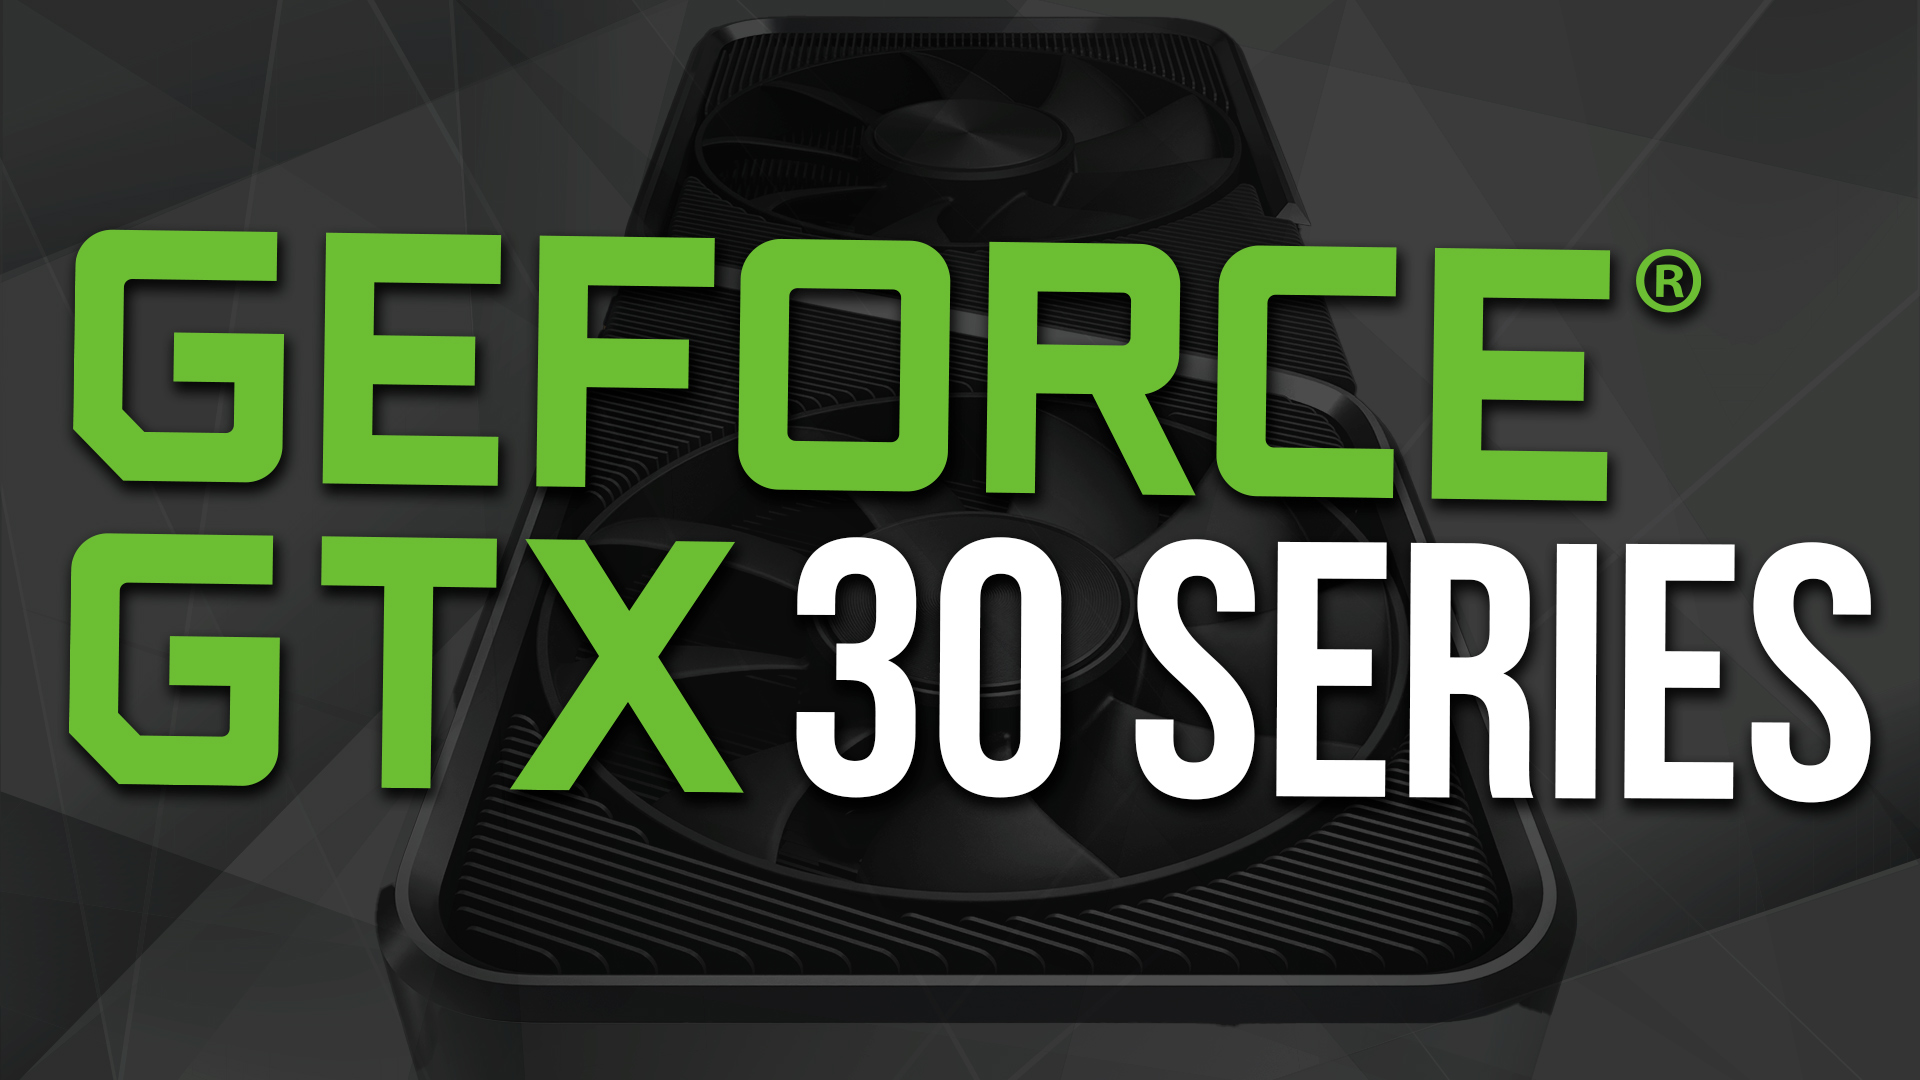 Nvidia, Grafikkarte, Nvidia Geforce, Nvidia GeForce RTX 3080, GeForce RTX, Nvidia GeForce RTX 3090, Nvidia Geforce RTX, Nvidia GeForce RTX 3060, RTX 30, nVidia Geforce RTX 30 Series, GeForce RTX 30 Serie